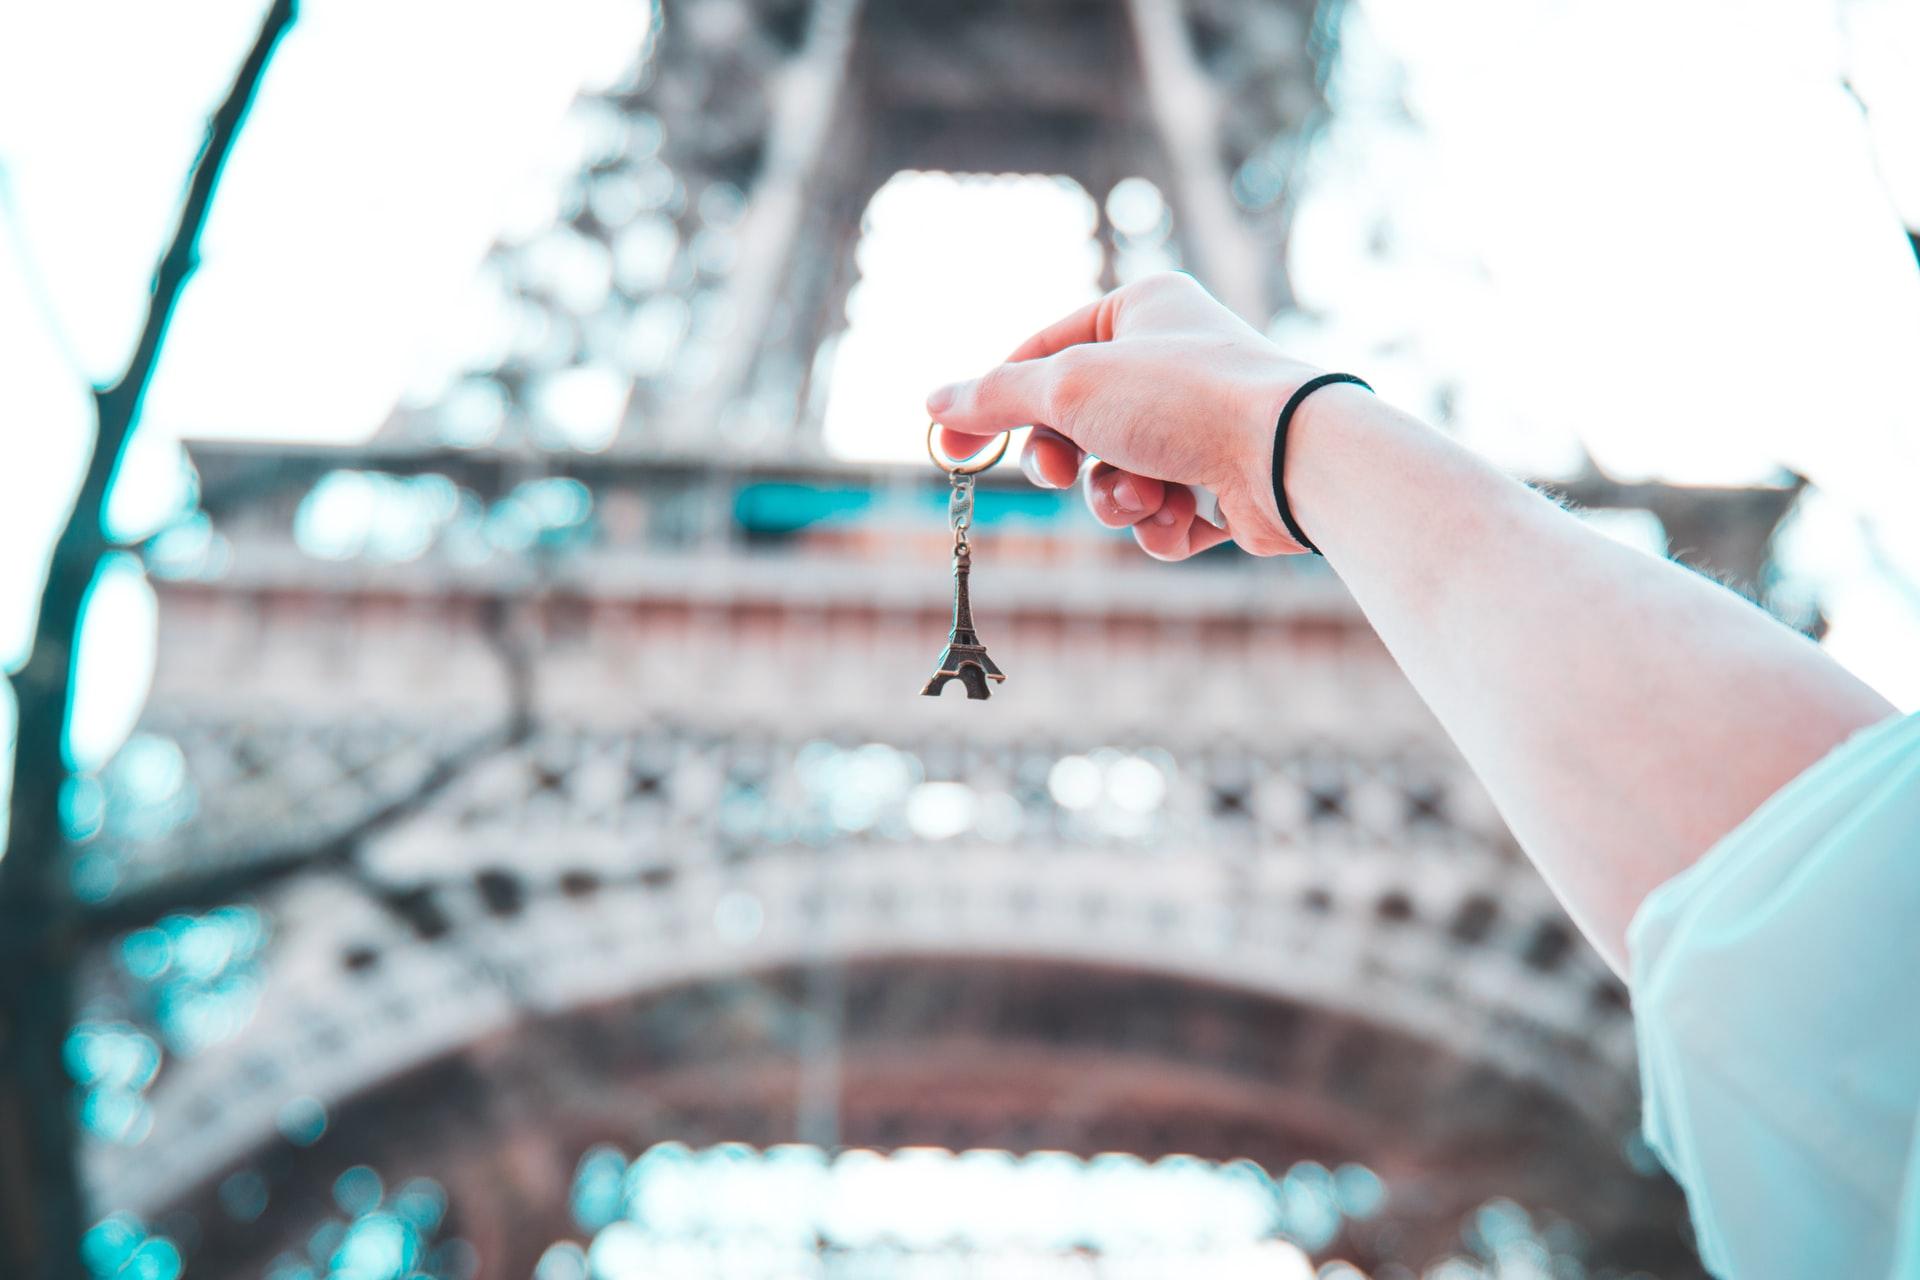 Eiffel Tower keychain souvenir for thrifty budget